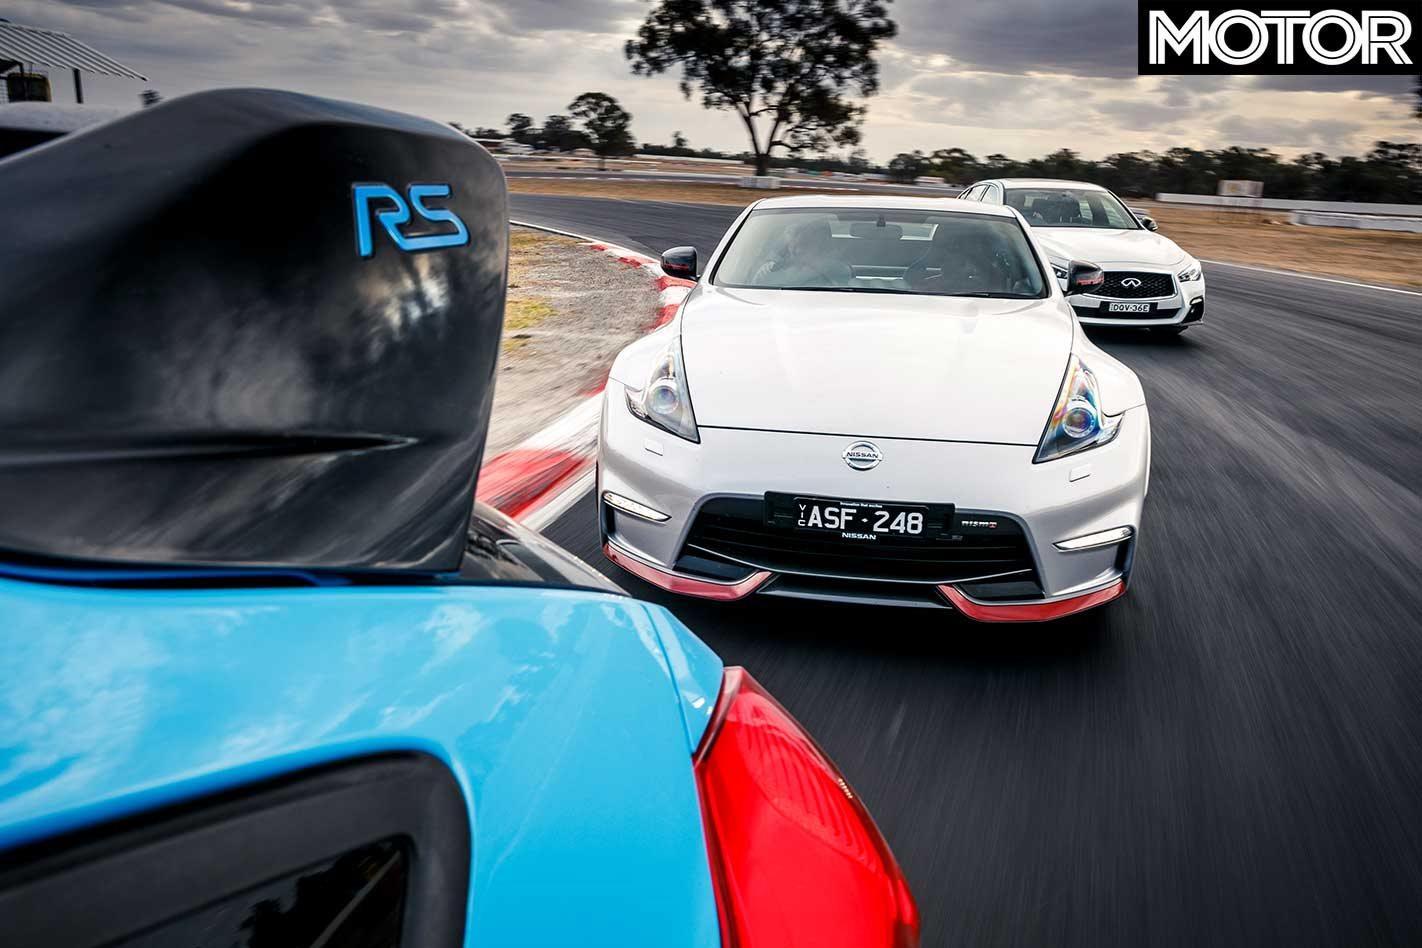 2018 Motor Best Value Performance Cars